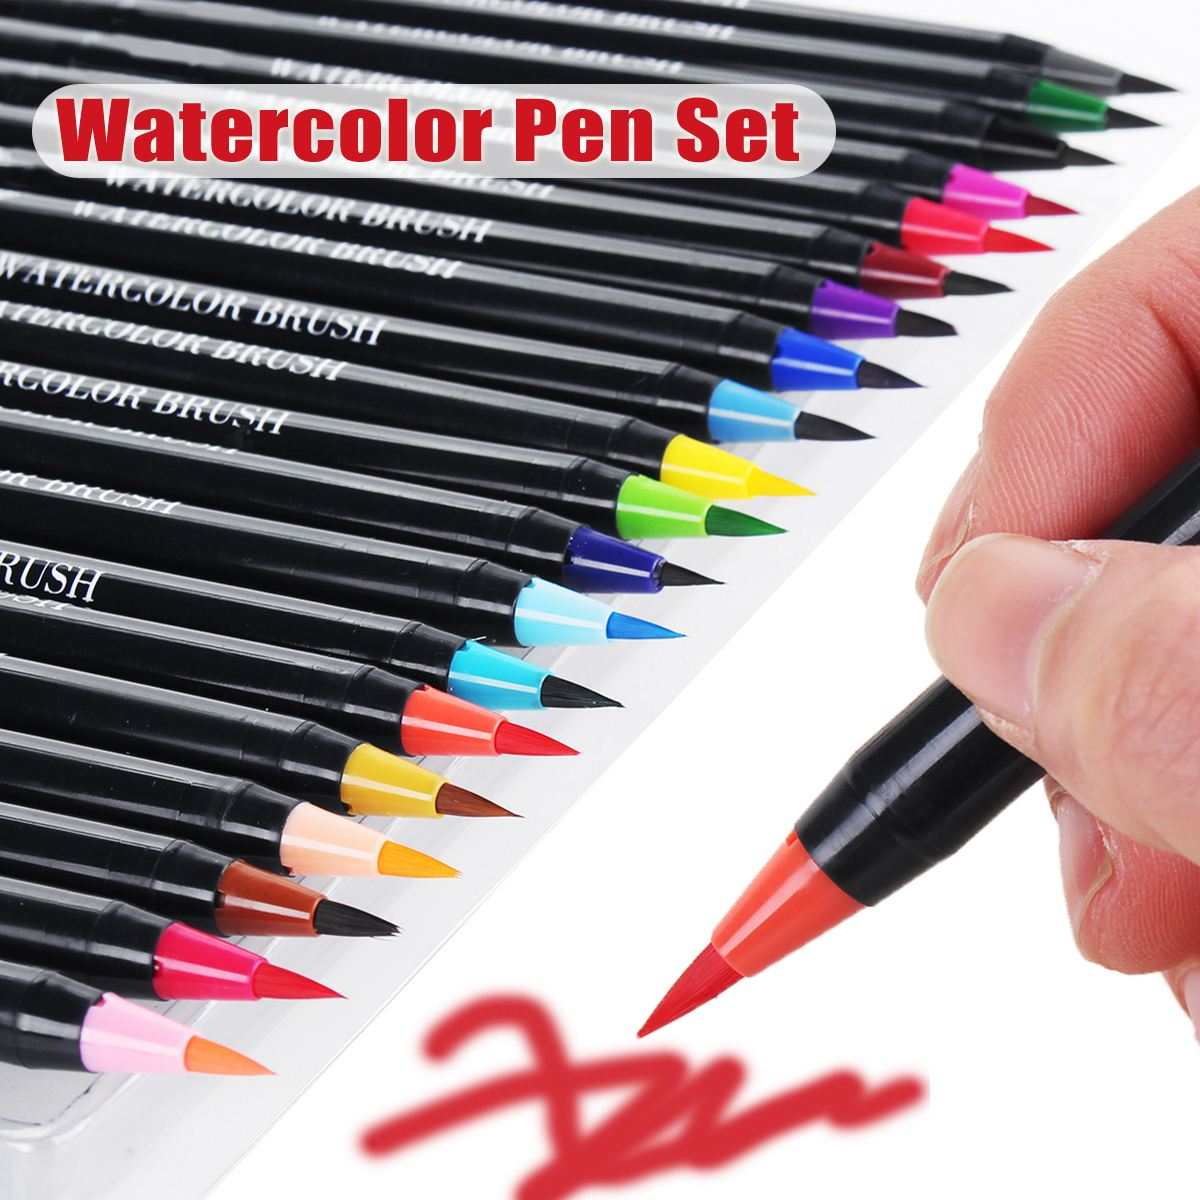 1- 20 Colors Premium Painting Soft Brush Pen Set Real Brush Pens - Watercolor Art Markers + 1 Water Brush Pen promotion touchfive 80 color art marker set fatty alcoholic dual headed artist sketch markers pen student standard